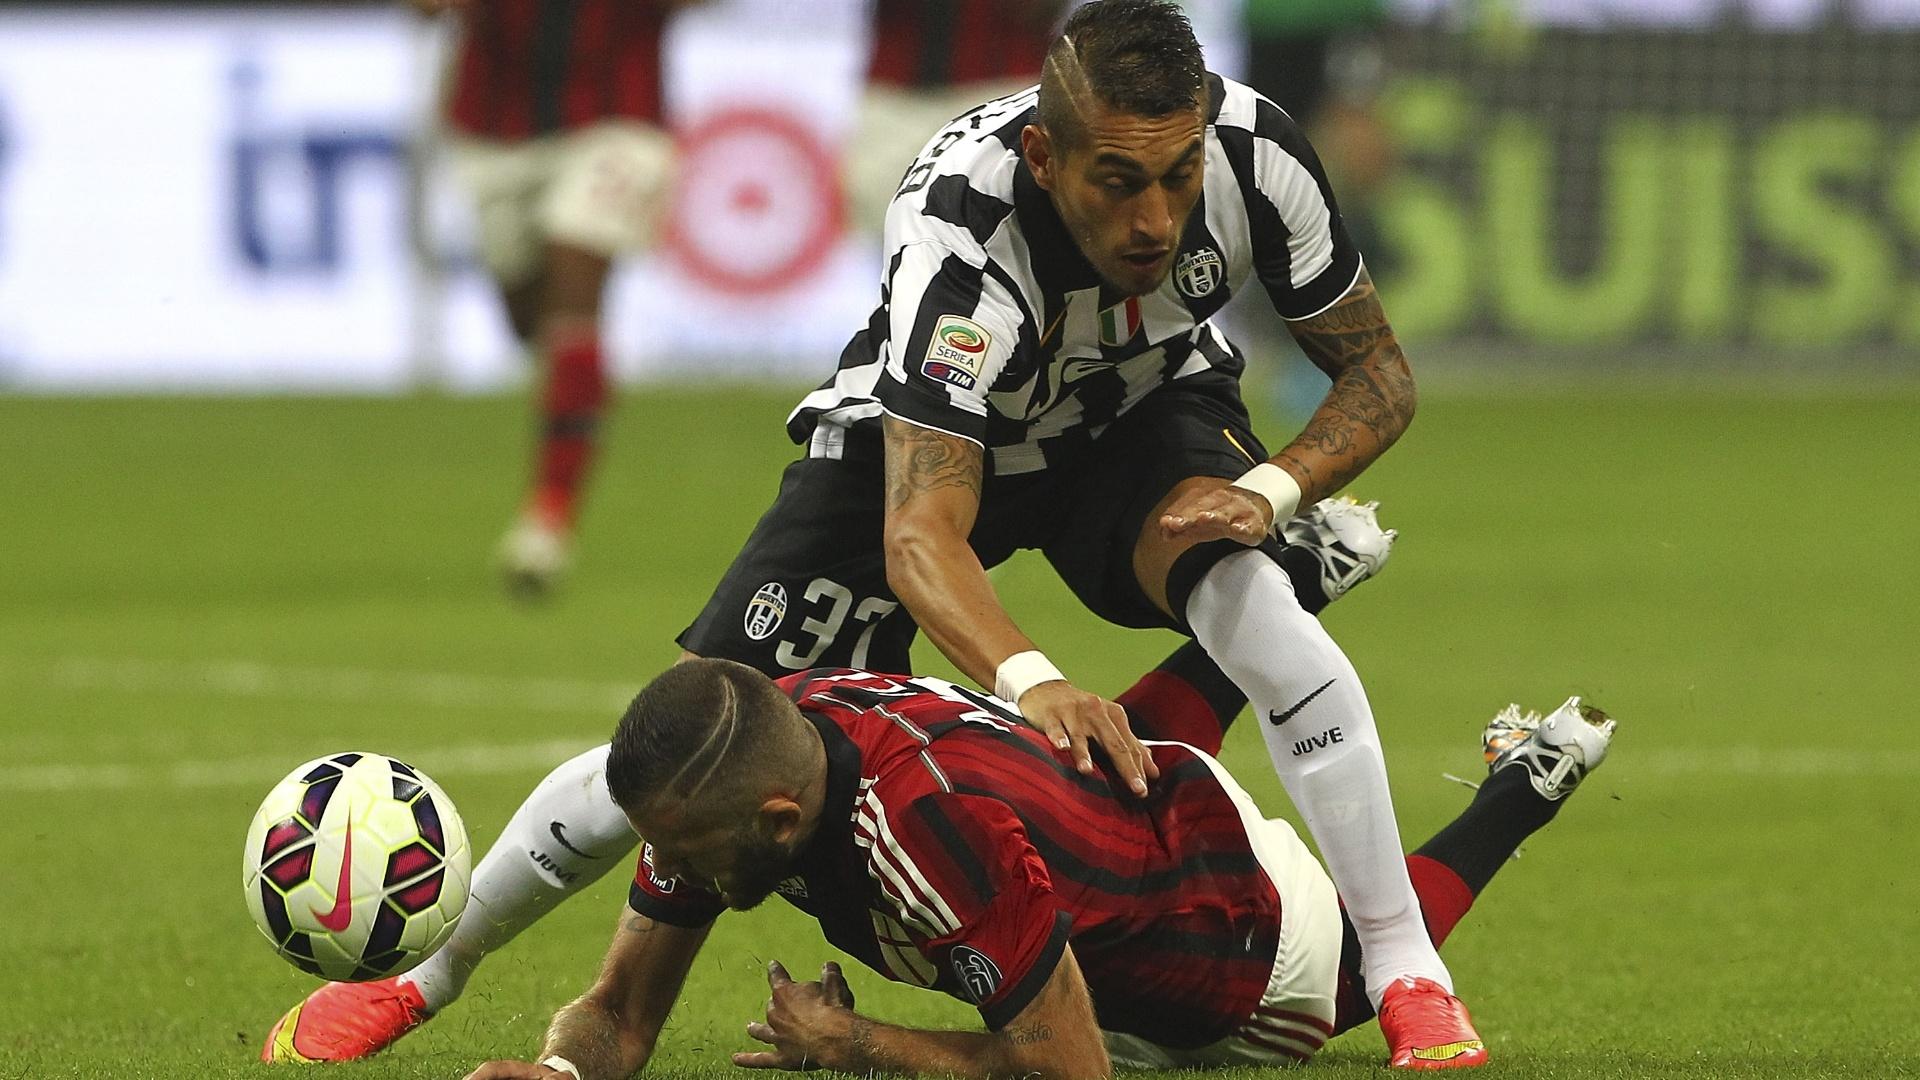 Roberto Maximiliano Pereyra, da Juventus, briga pela bola com Jeremy Menez, do Milan